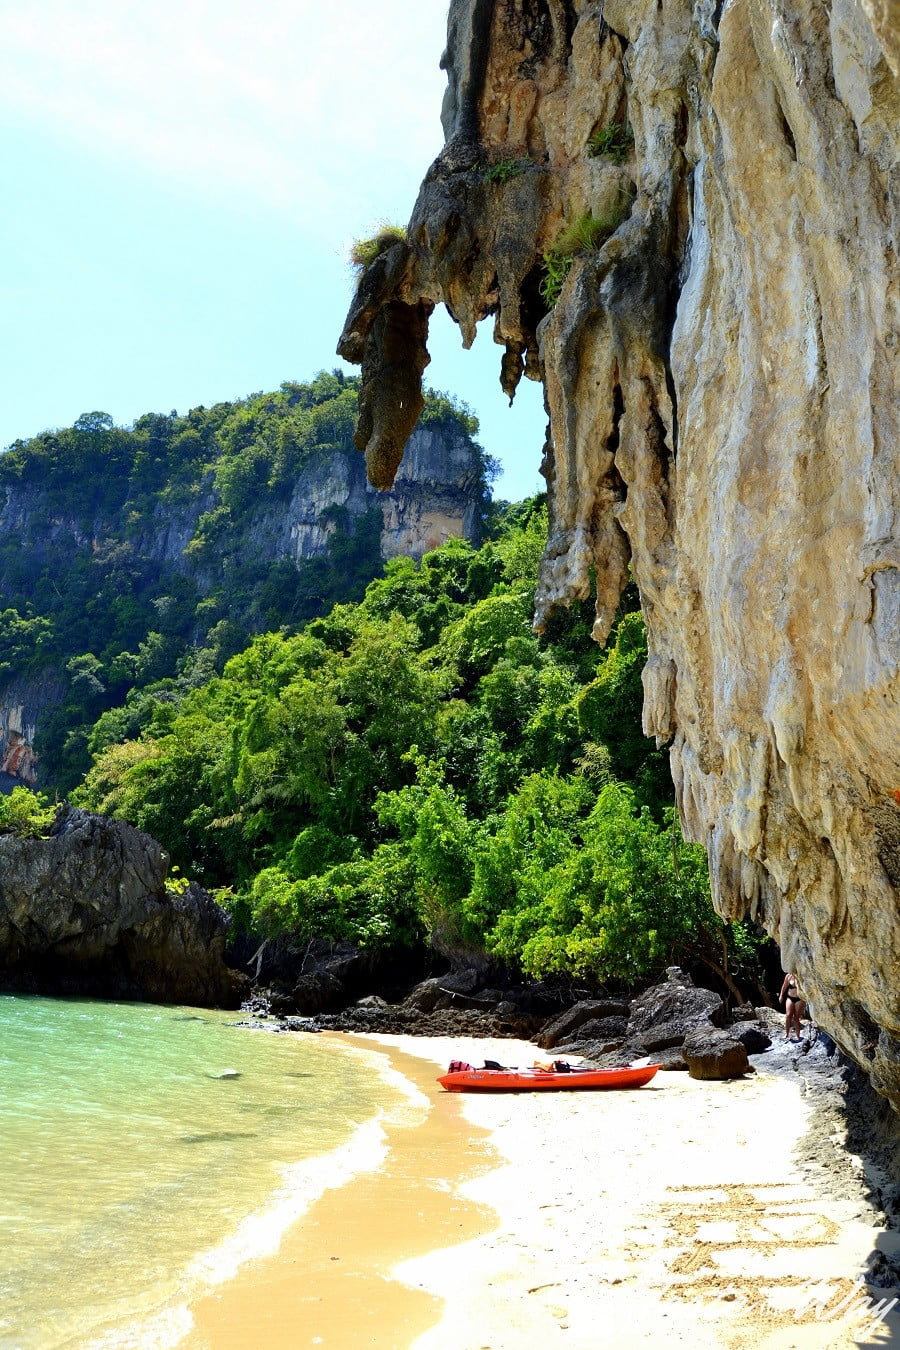 Kayaking to explore the coastline of Ao Nang #Krabi #Thailand #travel